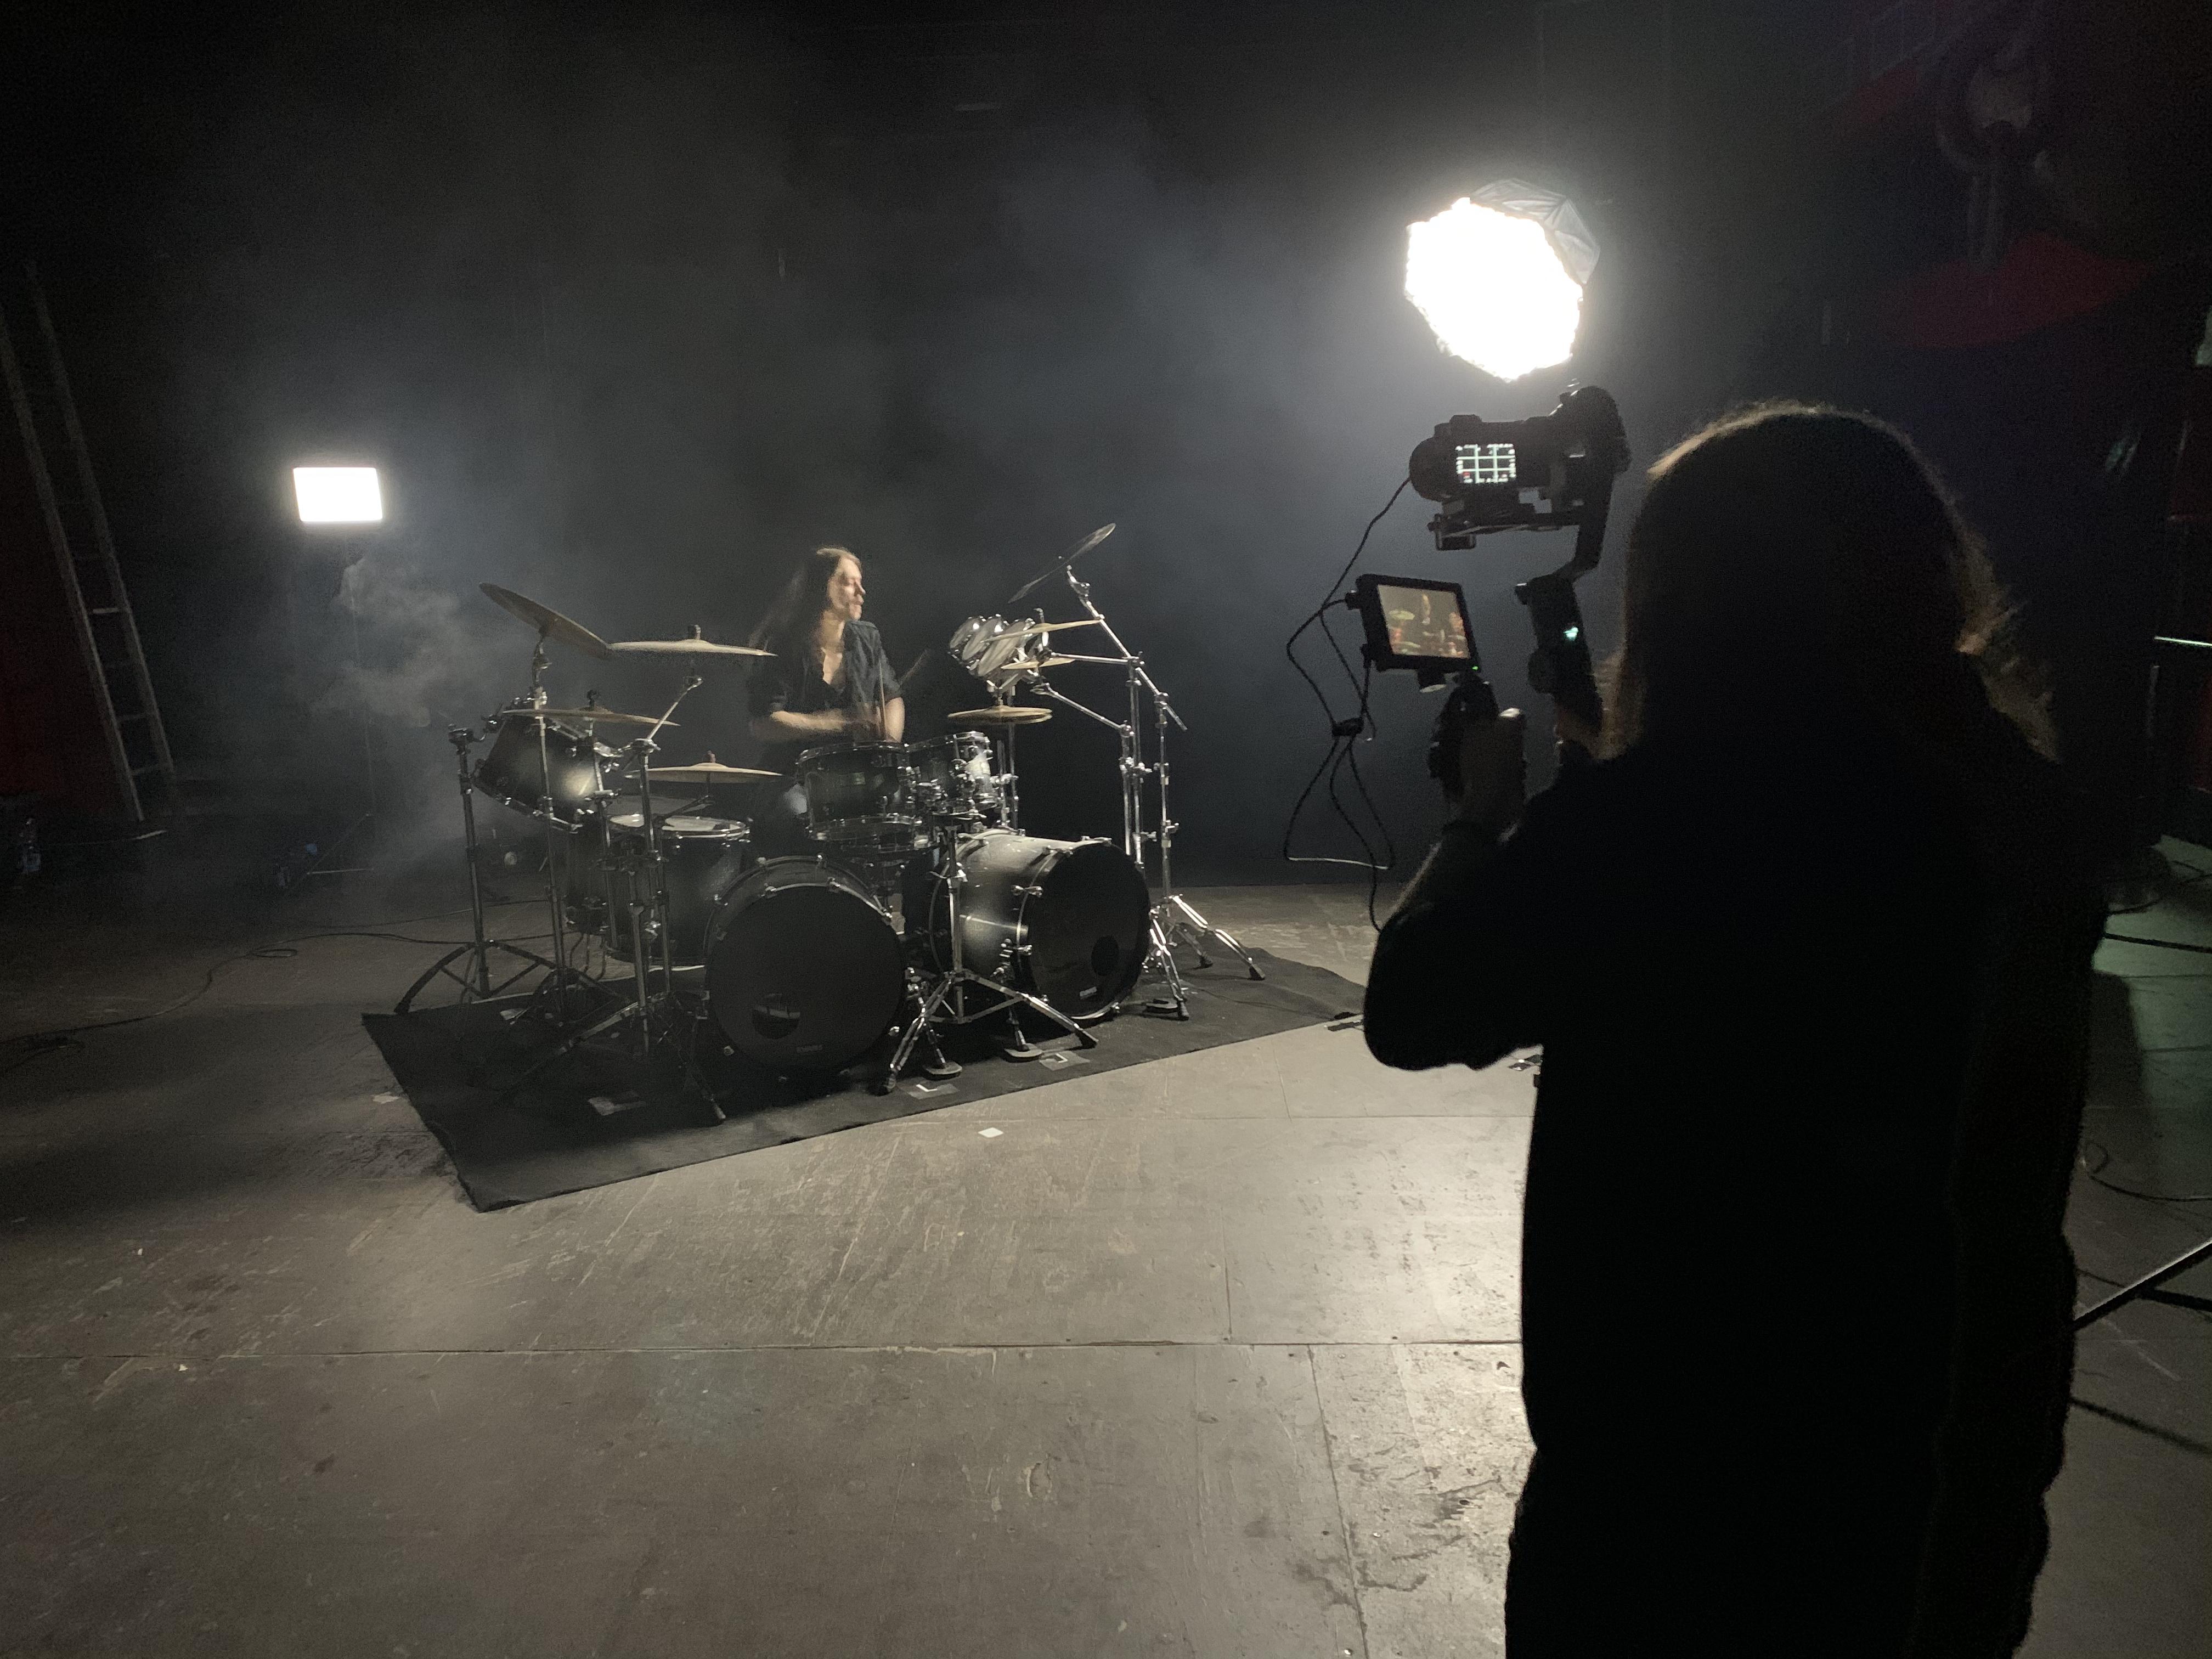 The-Very-End-Metal-Video-Shoot-behind-the-scenes_5319